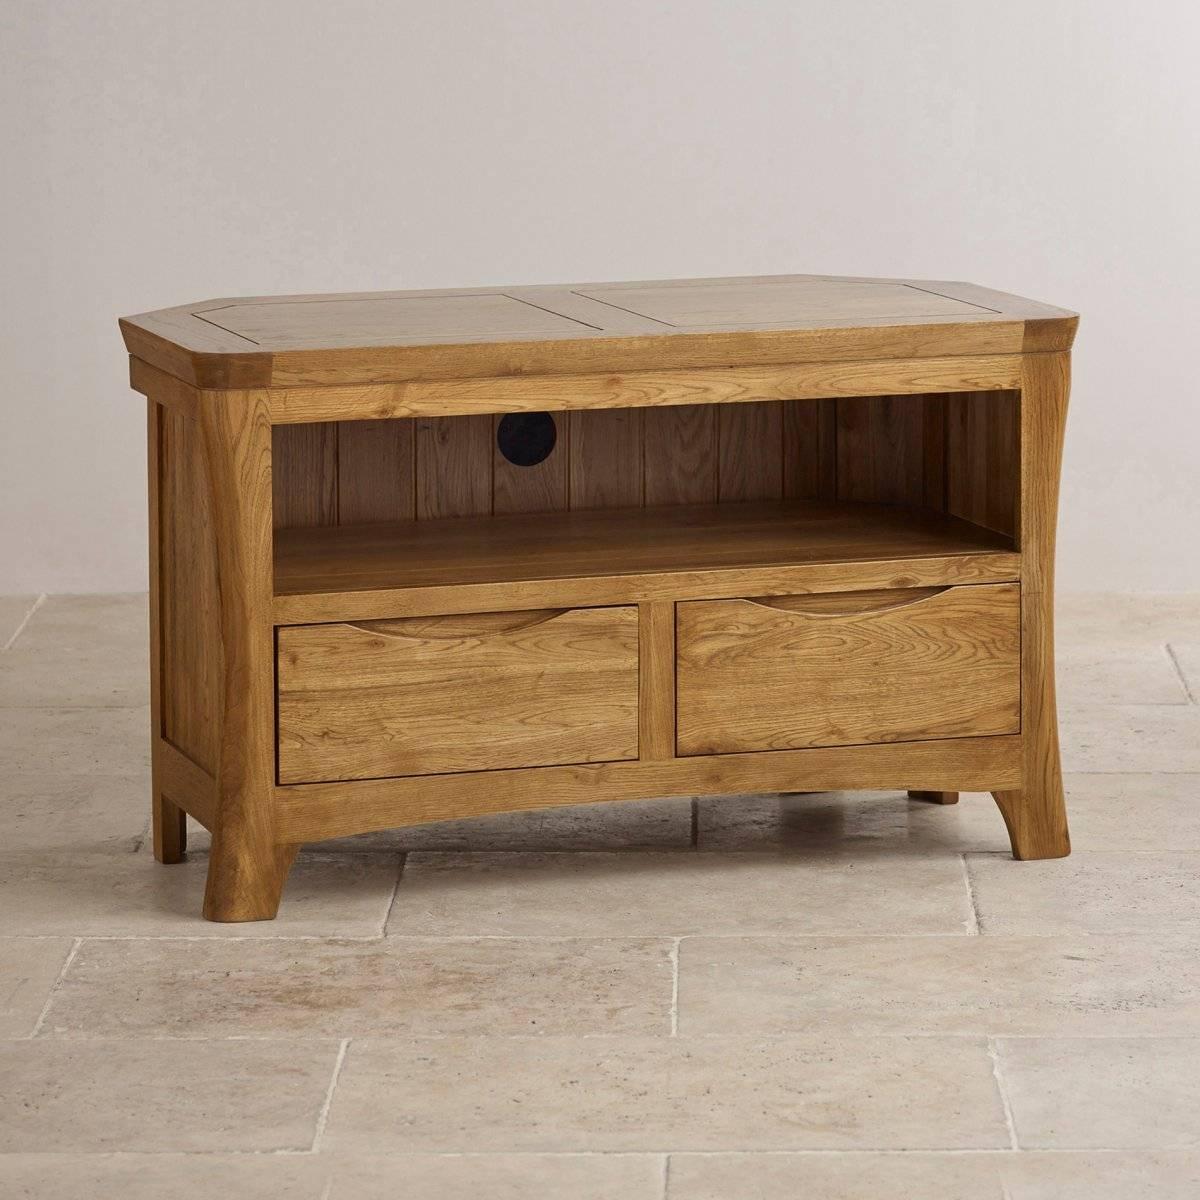 Orrick Corner Tv Cabinet In Rustic Oak | Oak Furniture Land throughout Rustic Oak Tv Stands (Image 5 of 15)